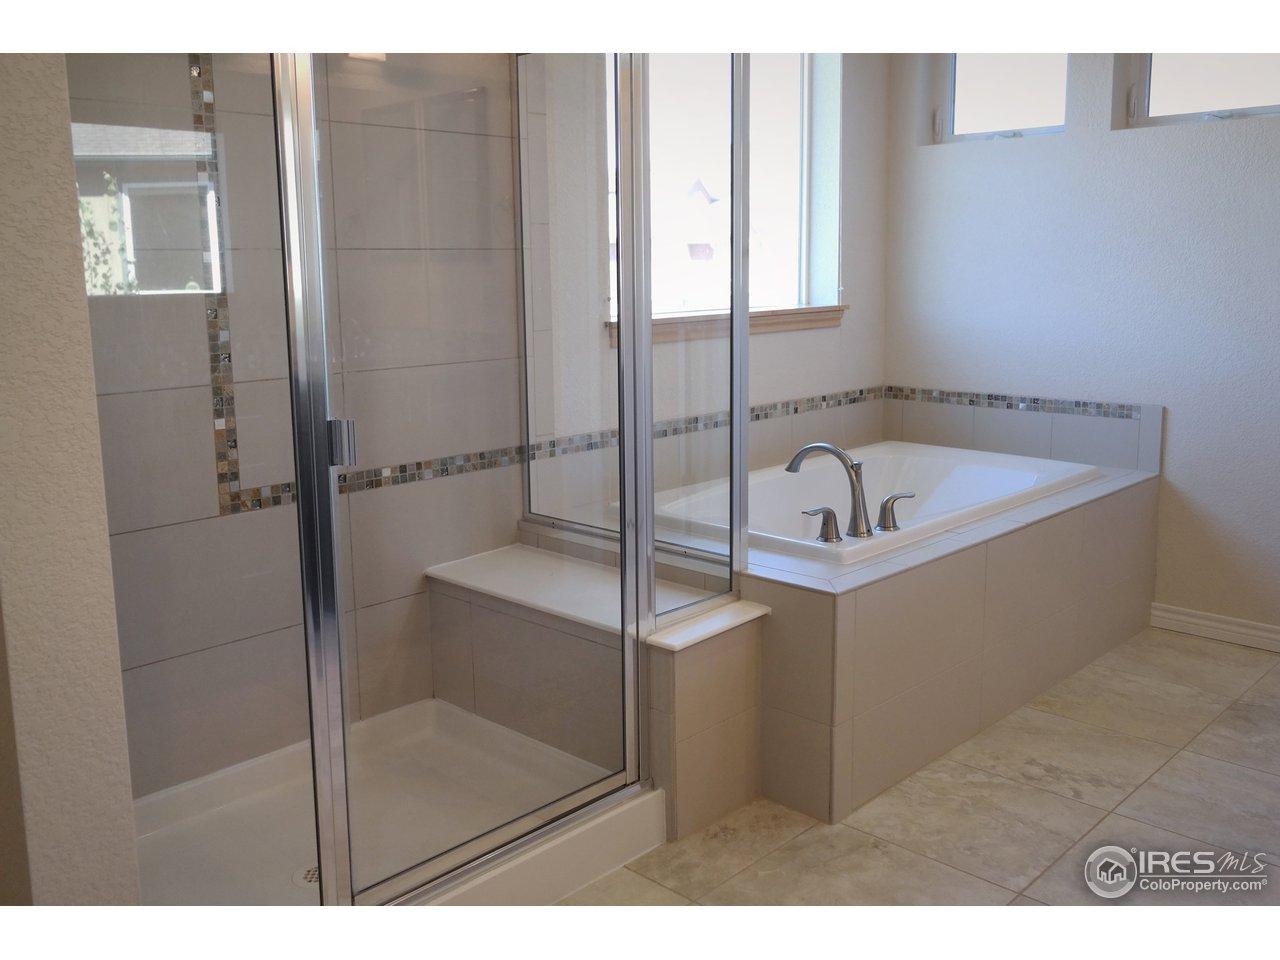 Elegant Shower & Soaking Tub